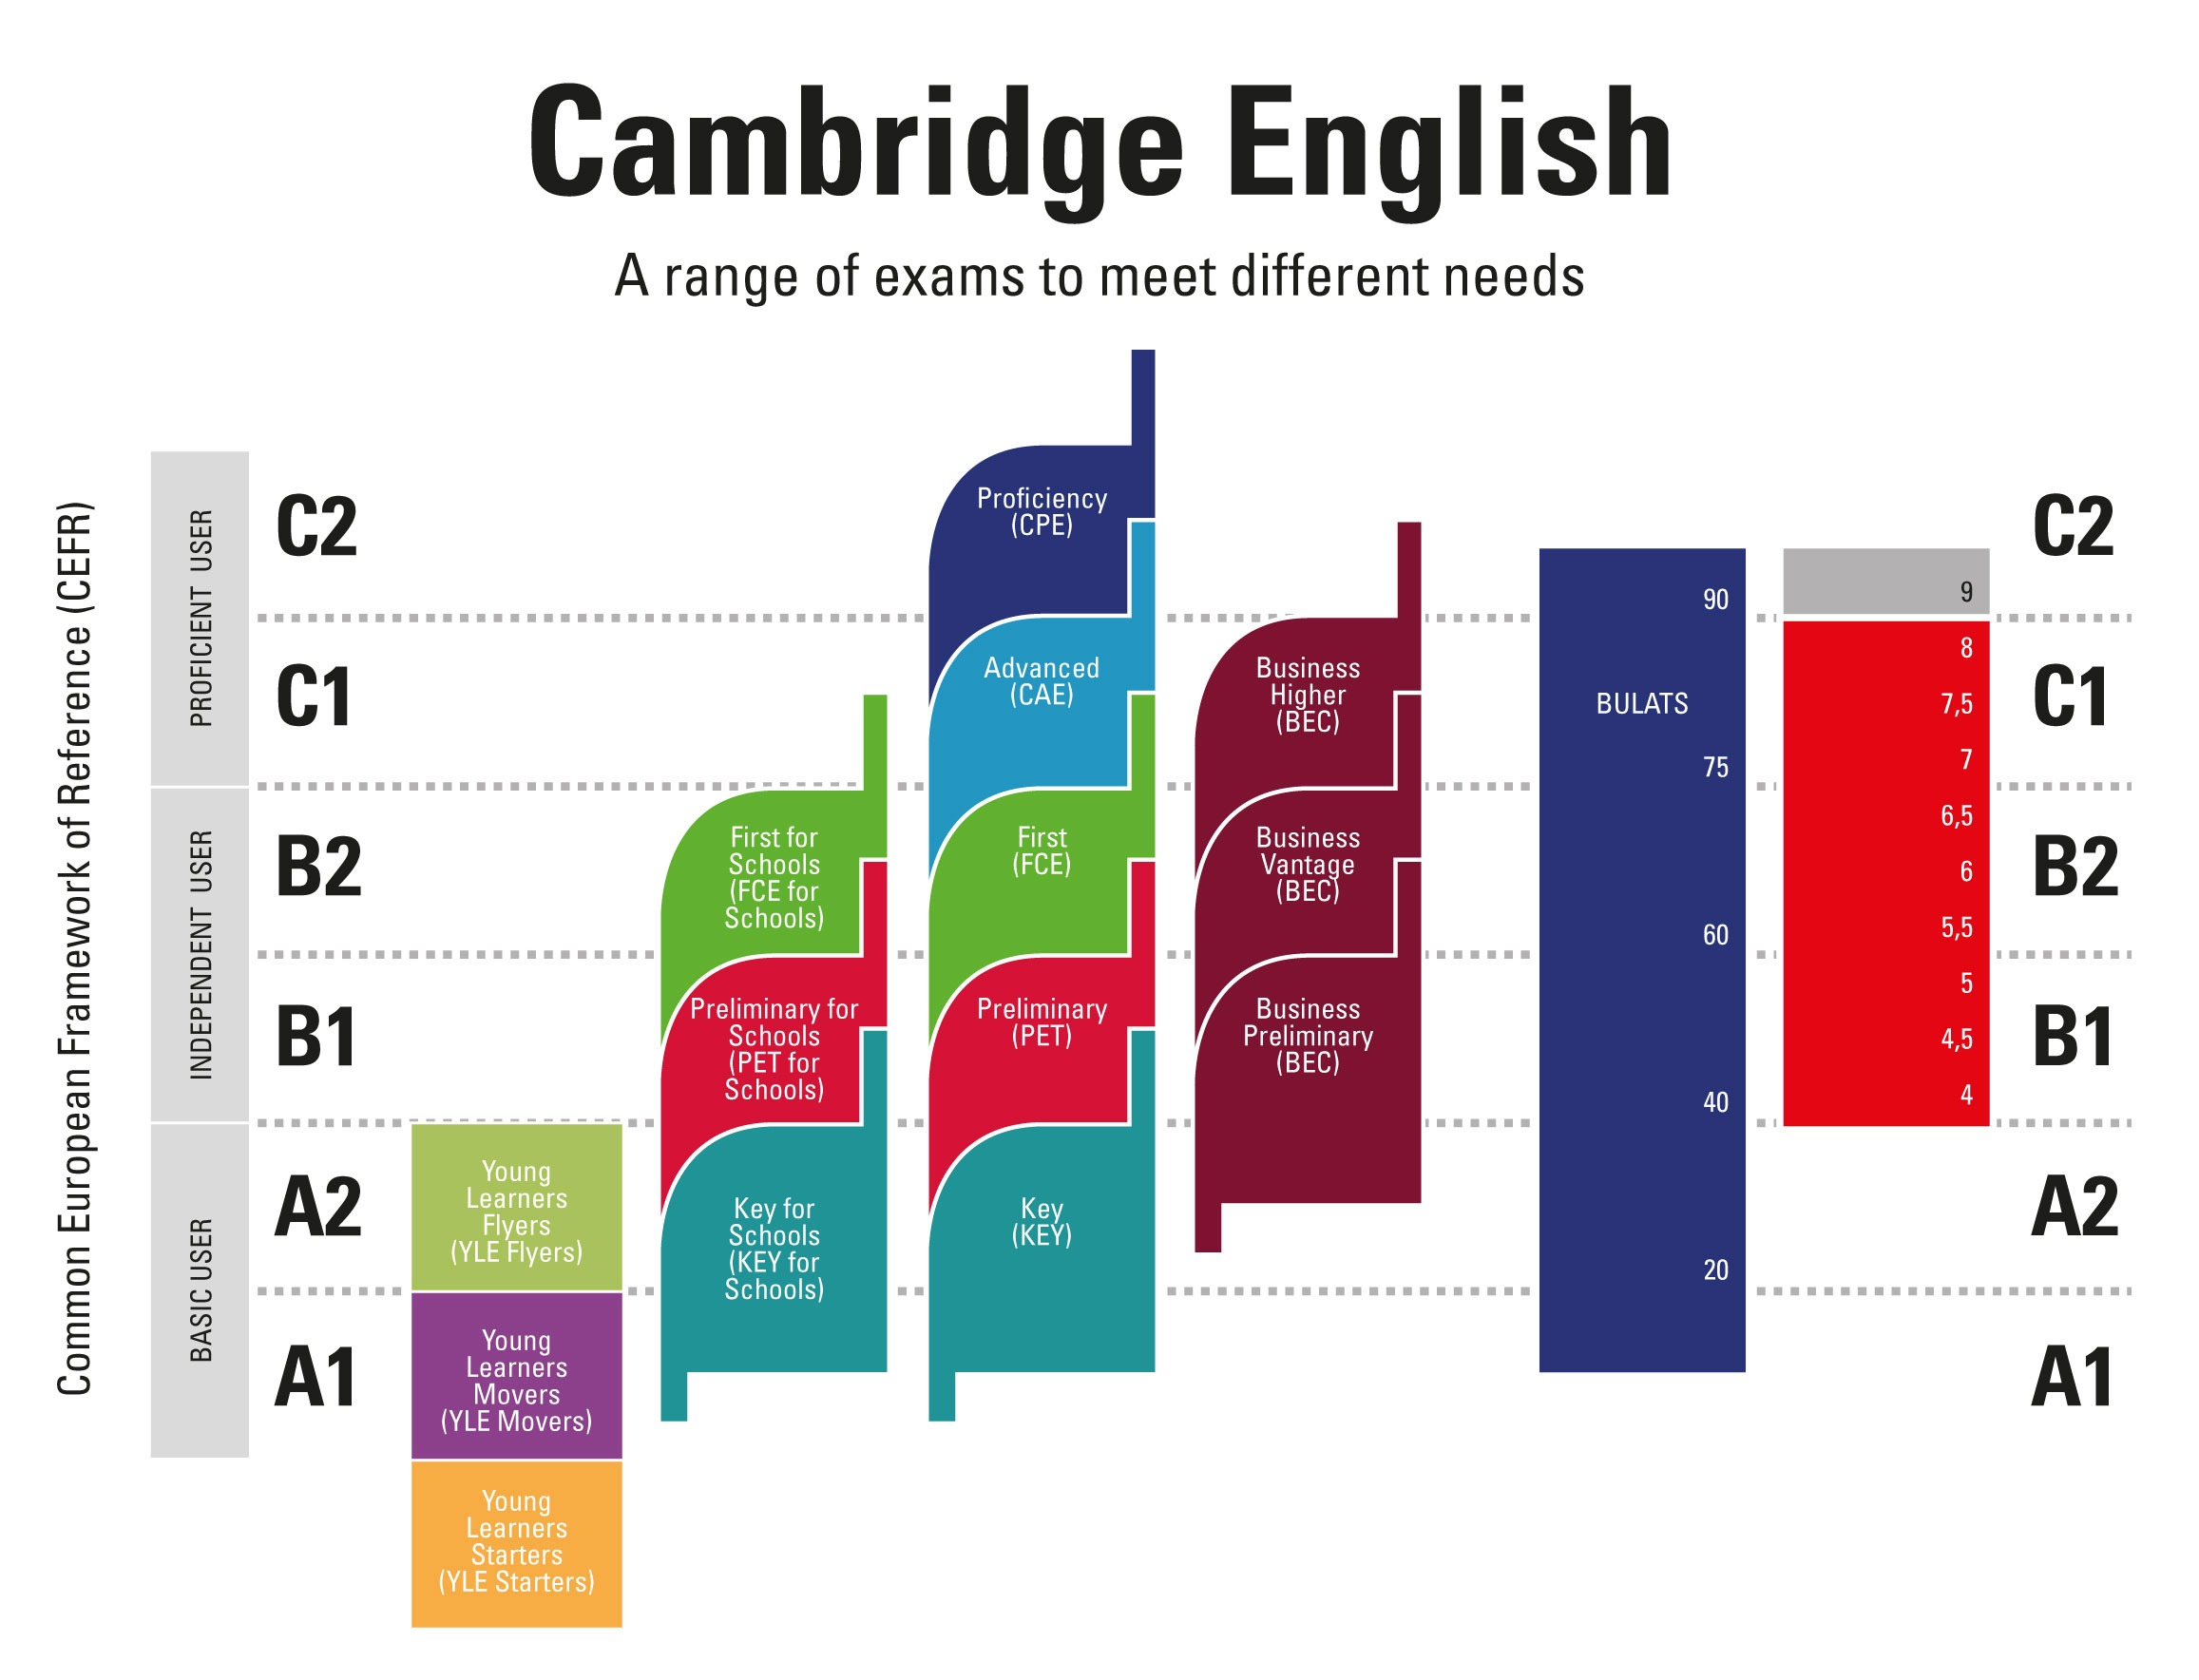 niveles de certificados Cambridge